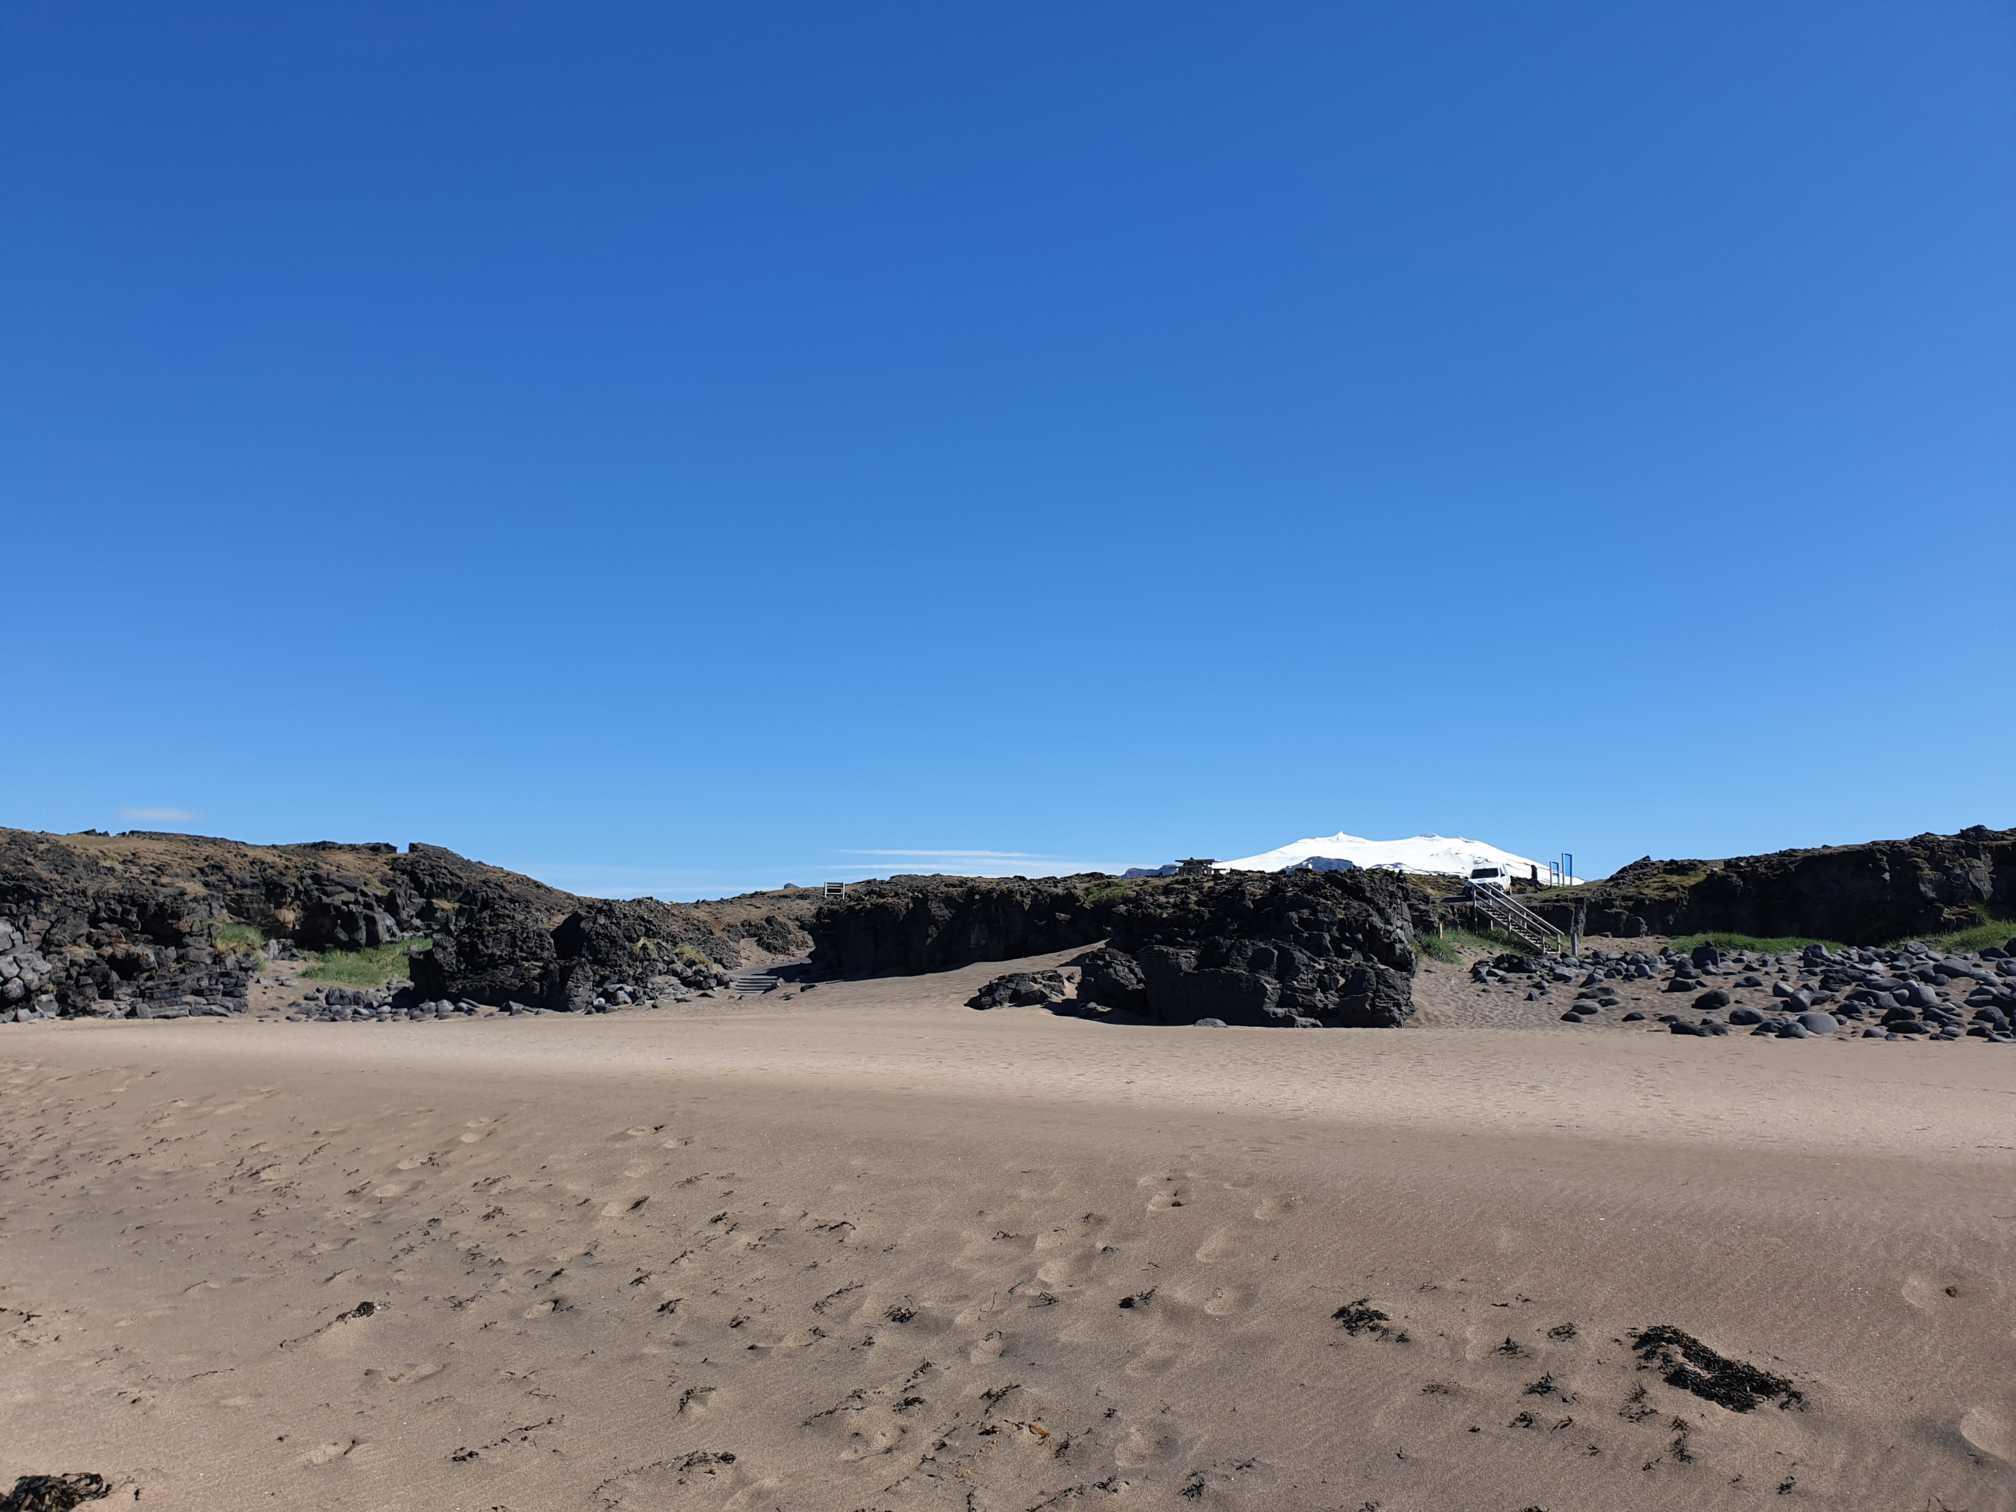 od pláže vidieť vulkán Snæfellsjökull